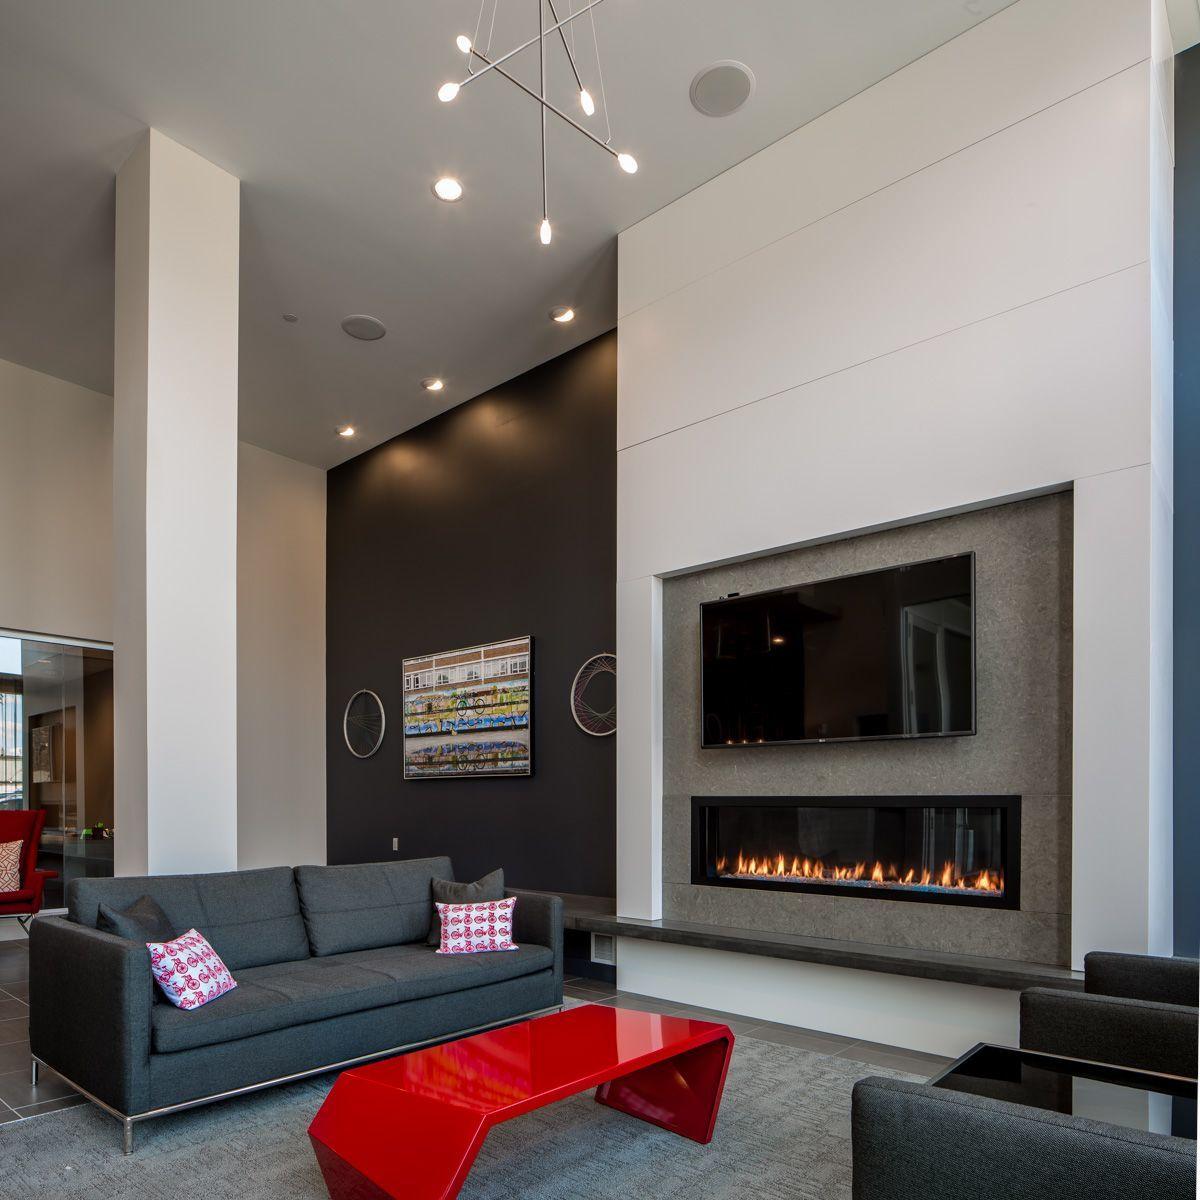 20 Best Studio Apartments In Minneapolis Mn With Pics